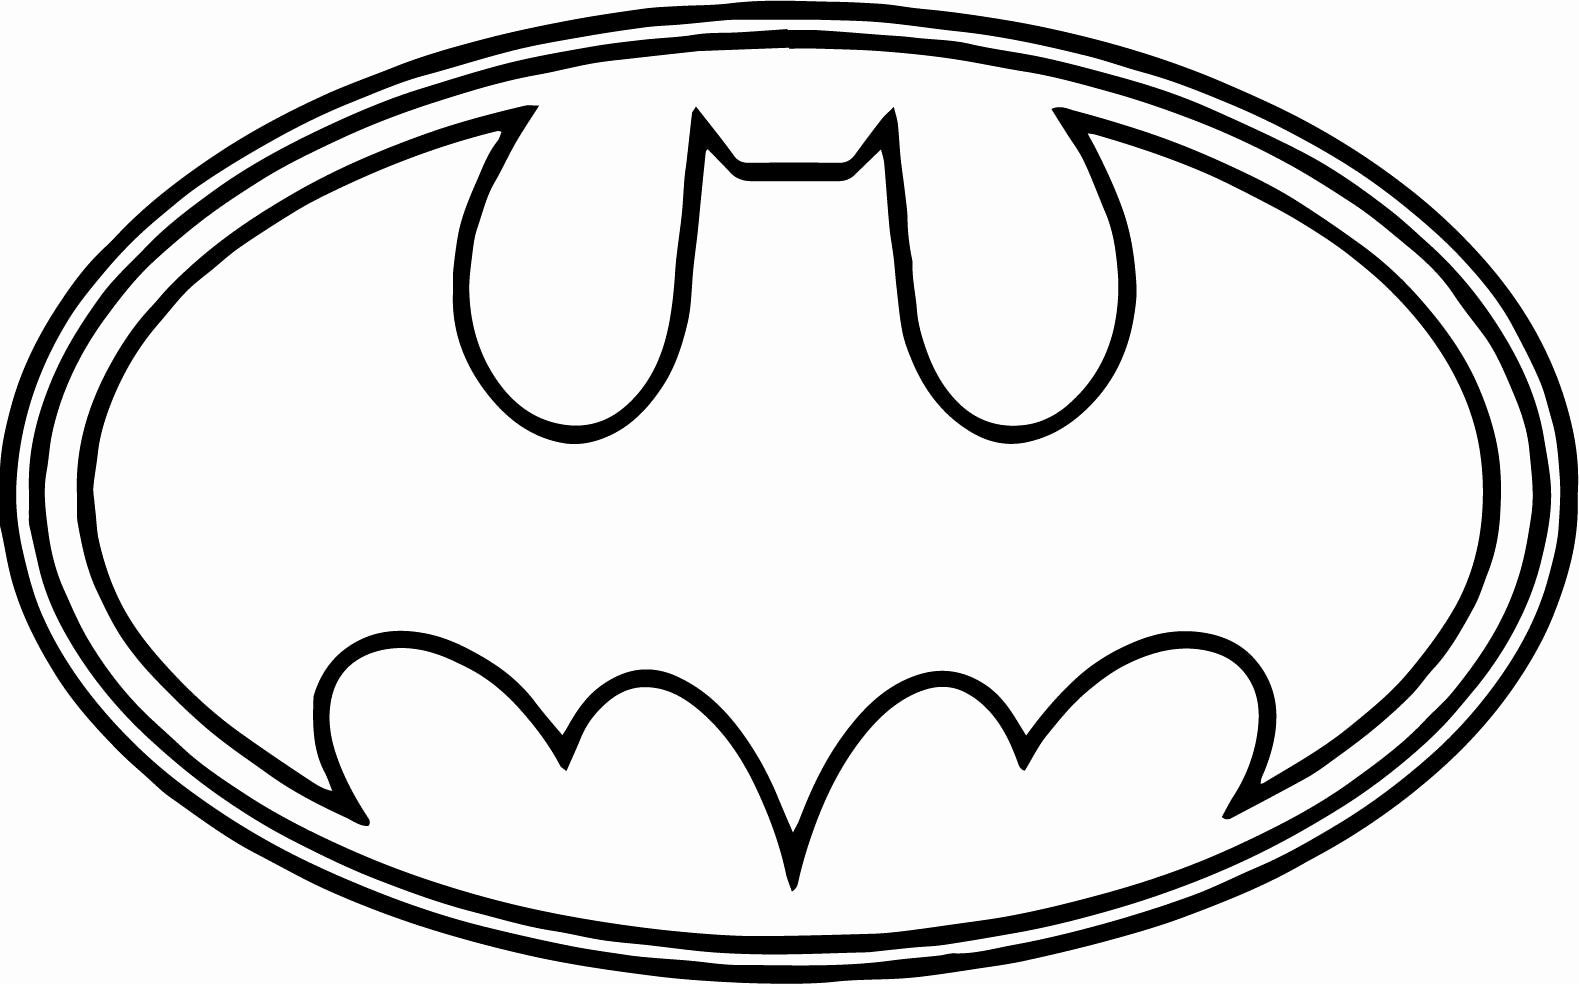 Batman Symbol Coloring Page Lovely Batman Logo Outline Coloring Page Batman Coloring Pages Coloring Pages Superhero Coloring Pages